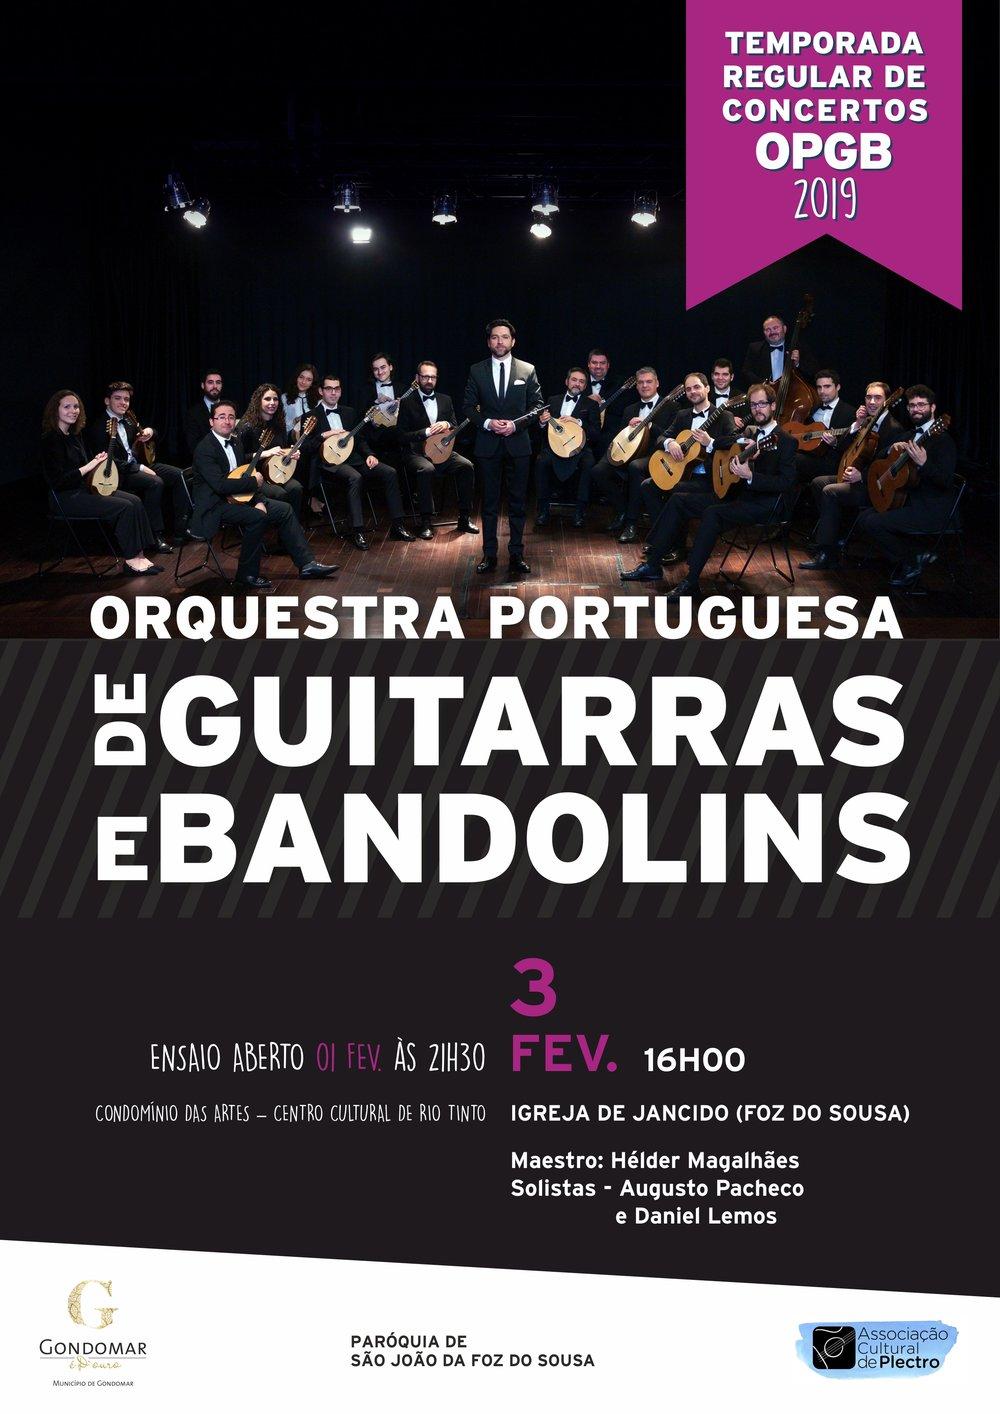 Cartaz Temporada Regular de Concertos OPGB 2019_3fev_jancido+Ensaio Aberto.jpg